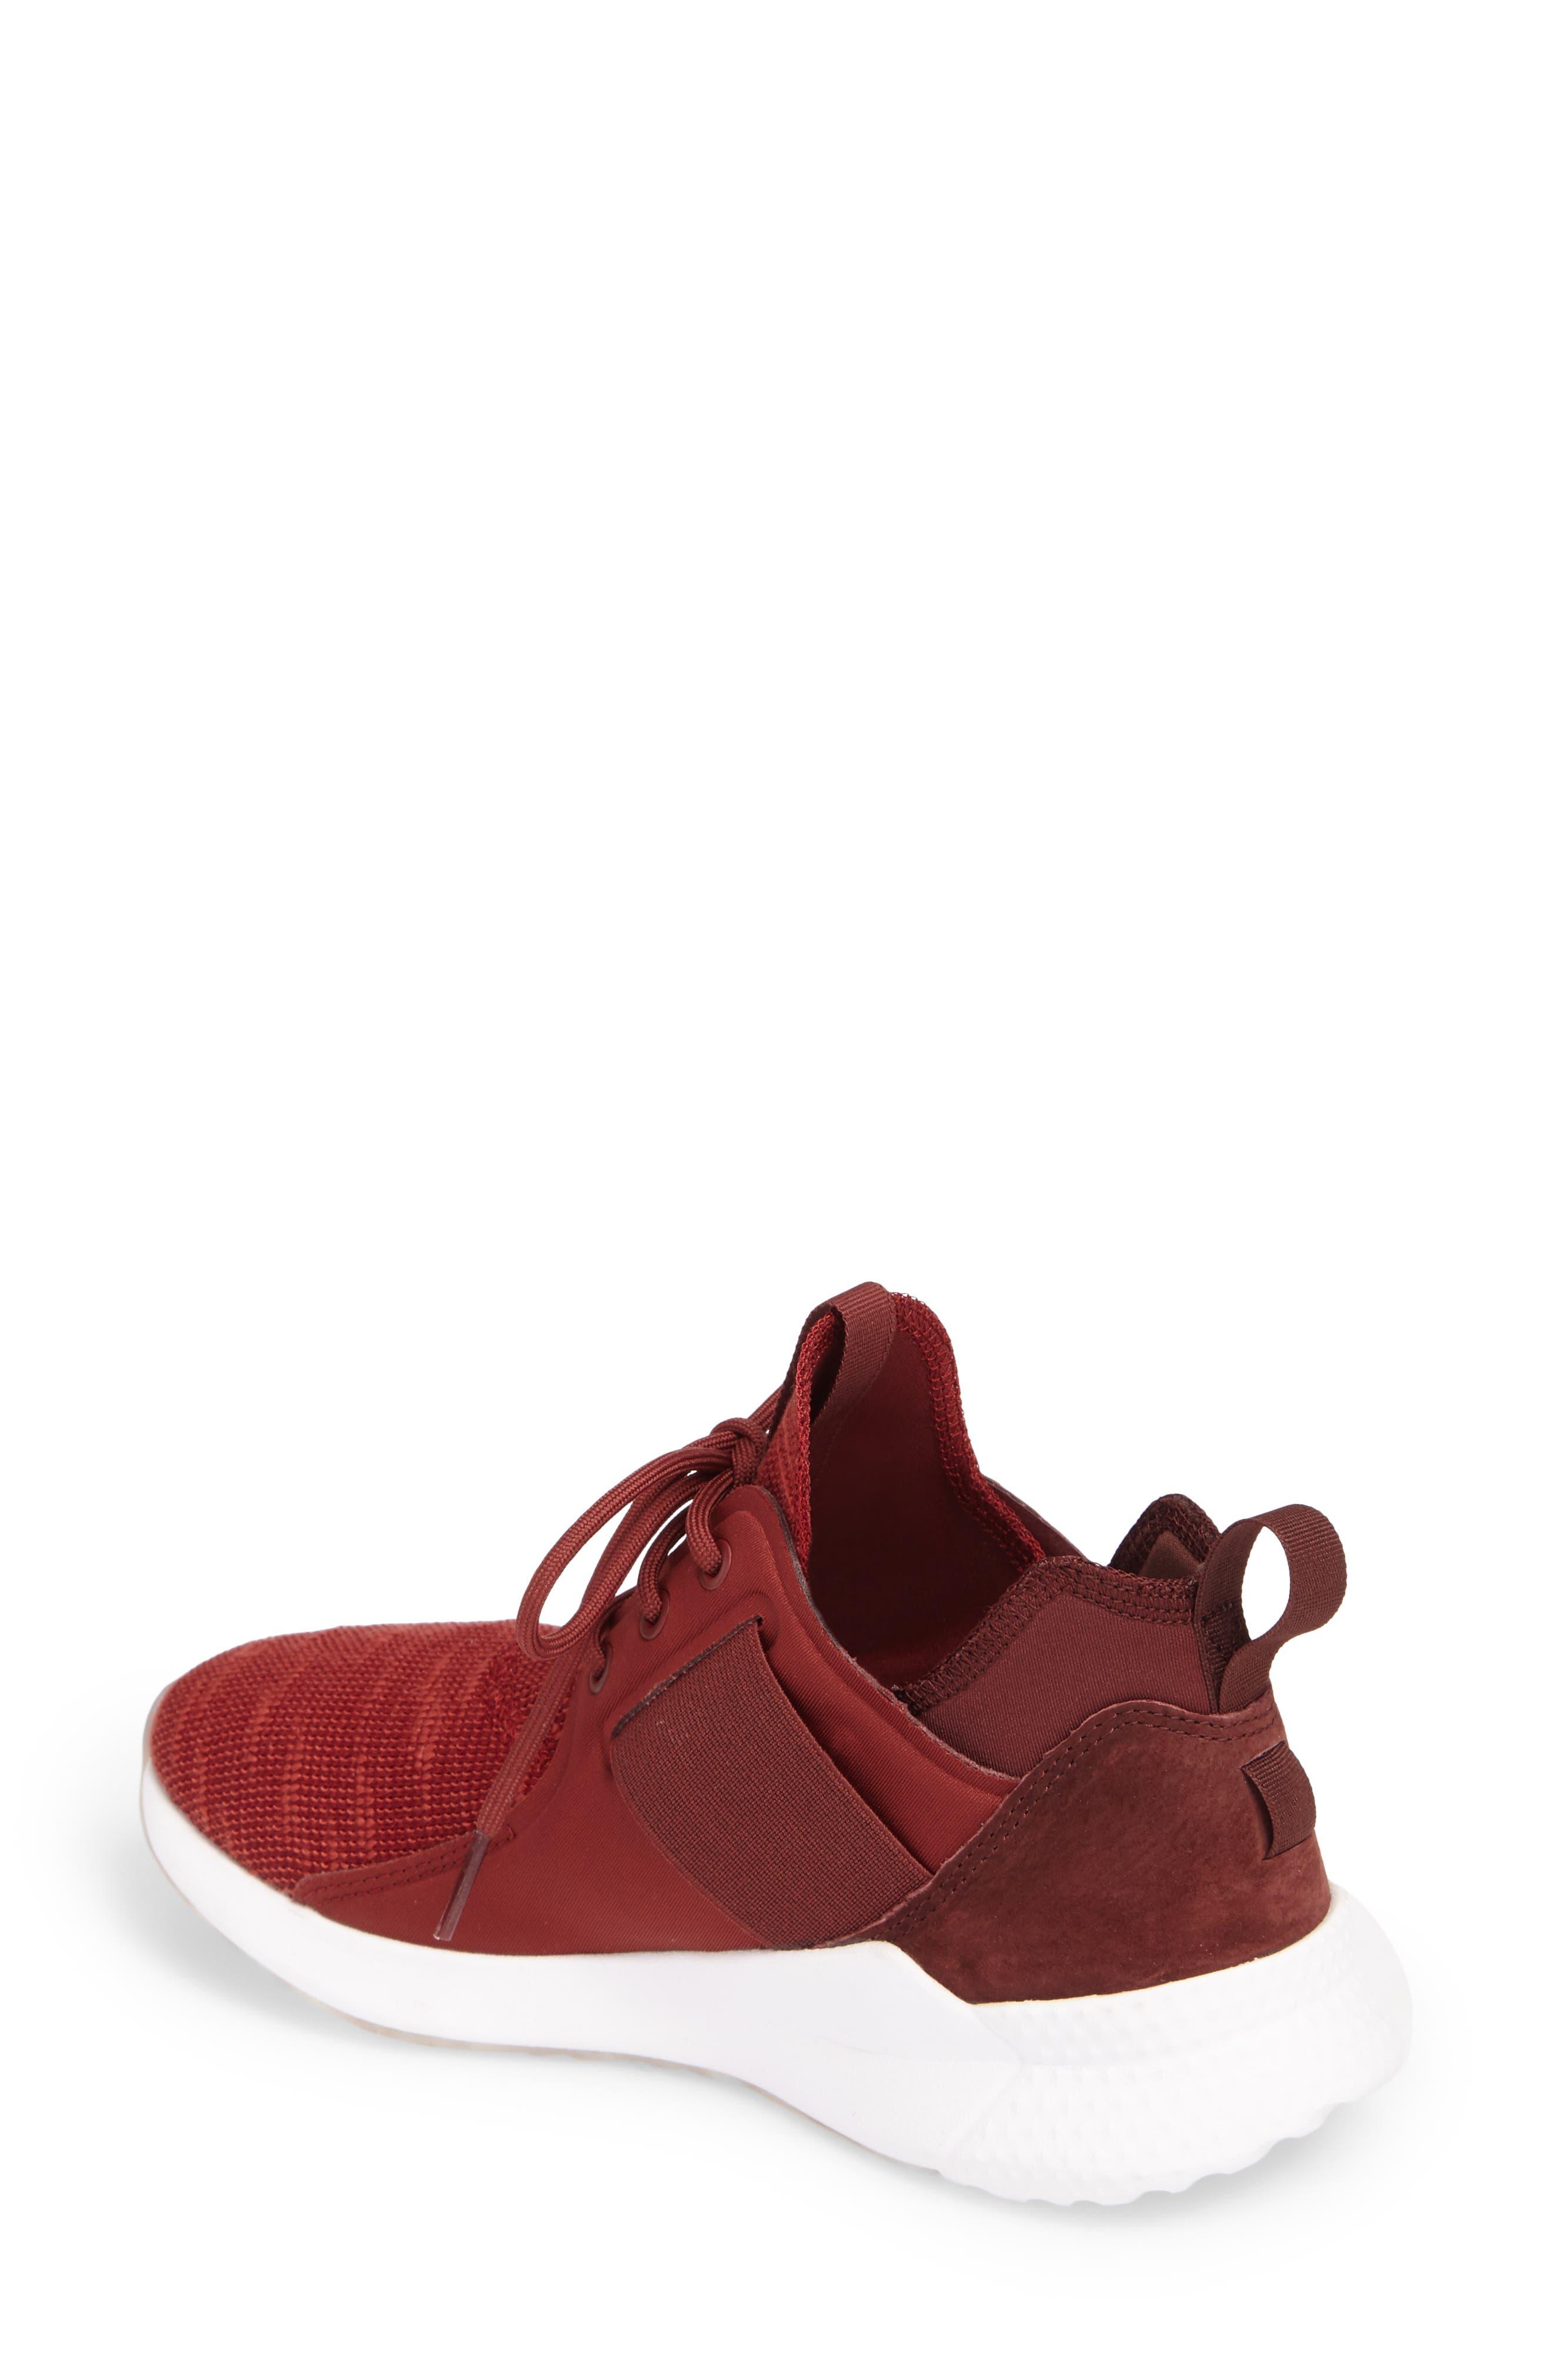 Alternate Image 2  - Reebok Gureso 1.0 Training Shoe (Women)